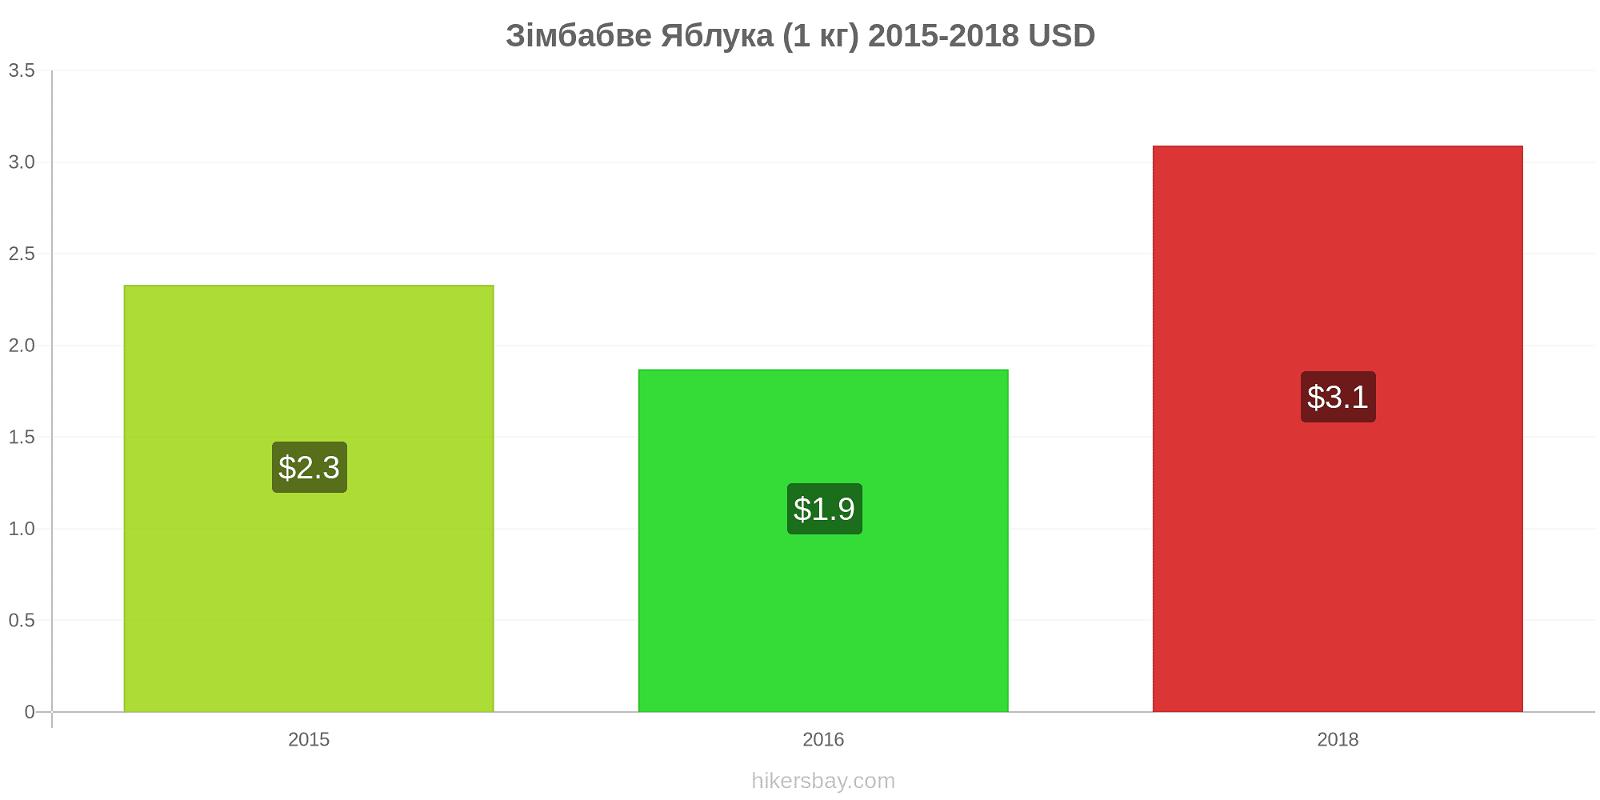 Зімбабве зміни цін Яблука (1 кг) hikersbay.com